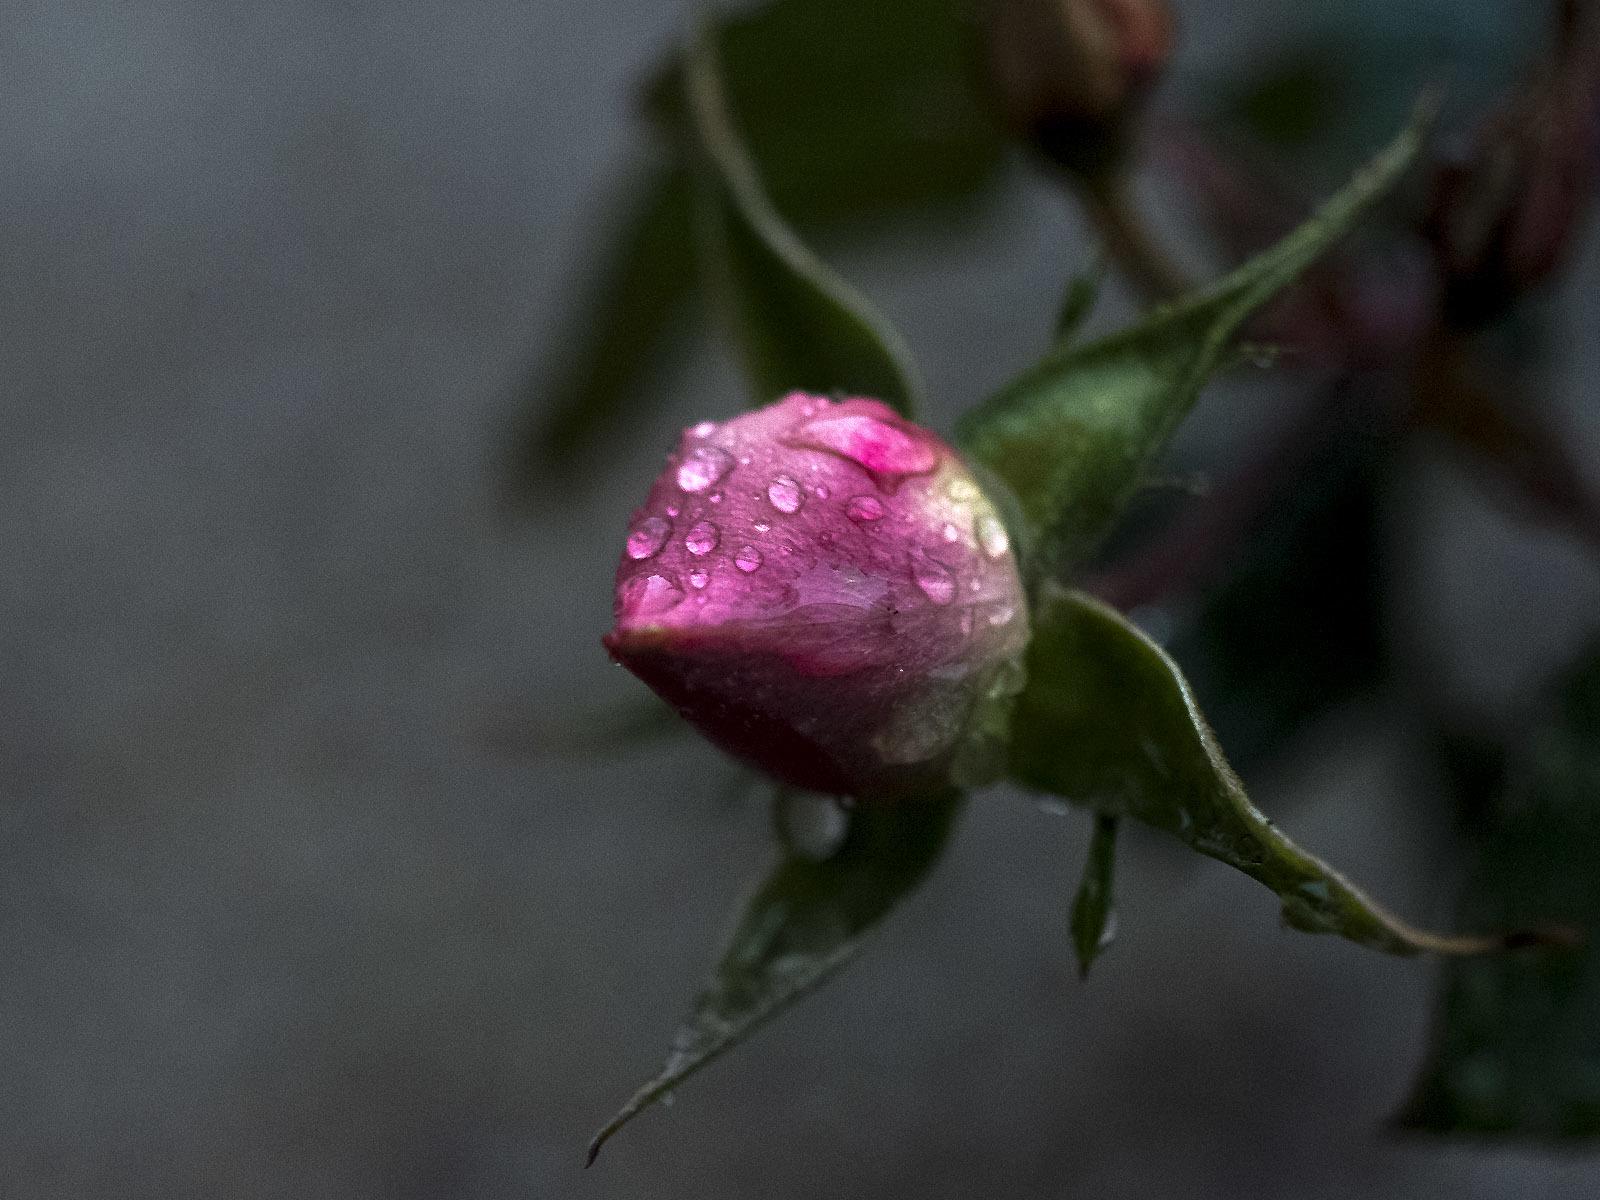 RICOH GXR A12 50mm F2.5 MACROで撮った花の写真(3)_e0367501_17241700.jpg